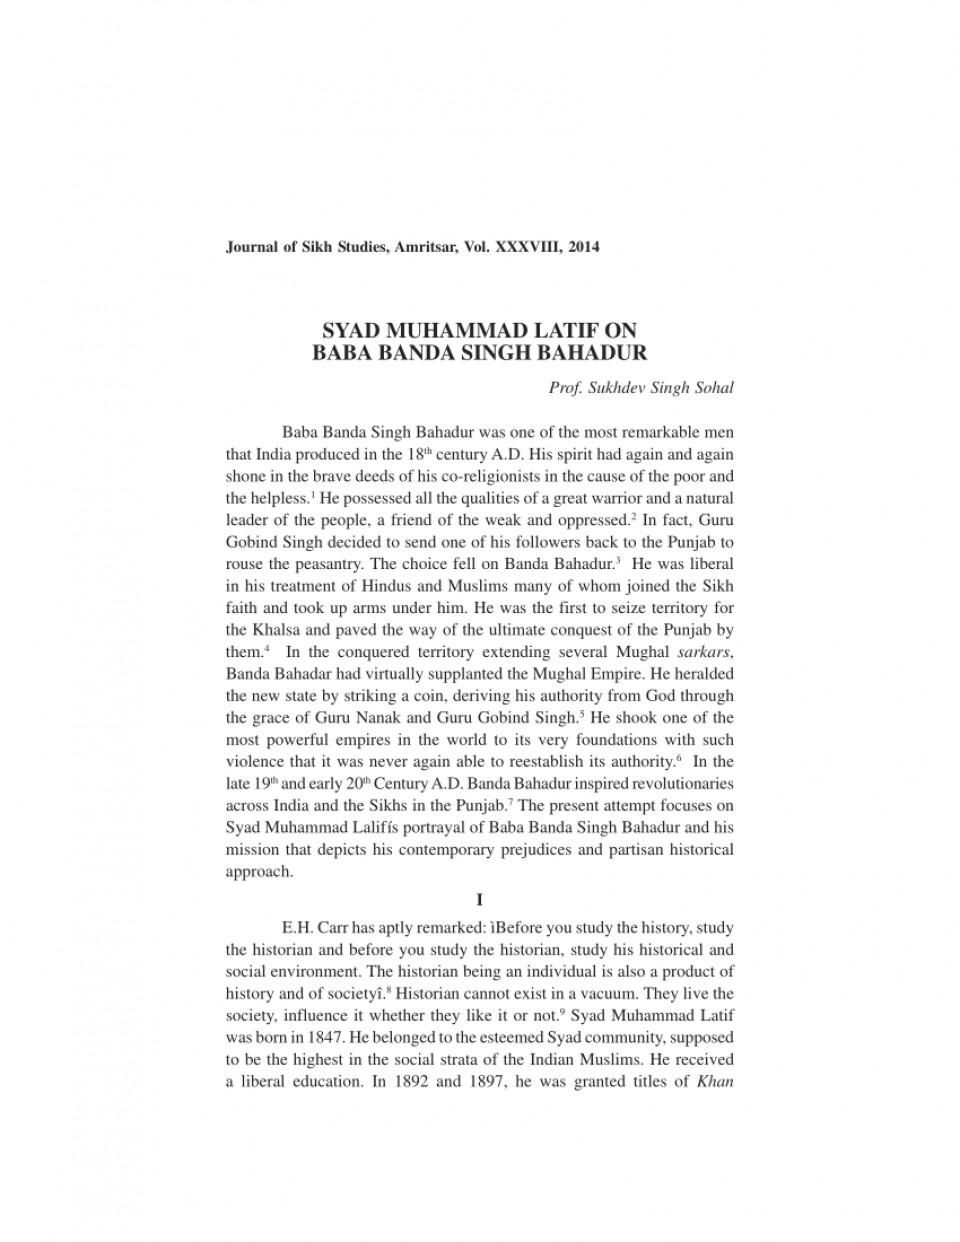 001 Essay Example On Banda Singh Bahadur In Punjabi Formidable Baba Language 960